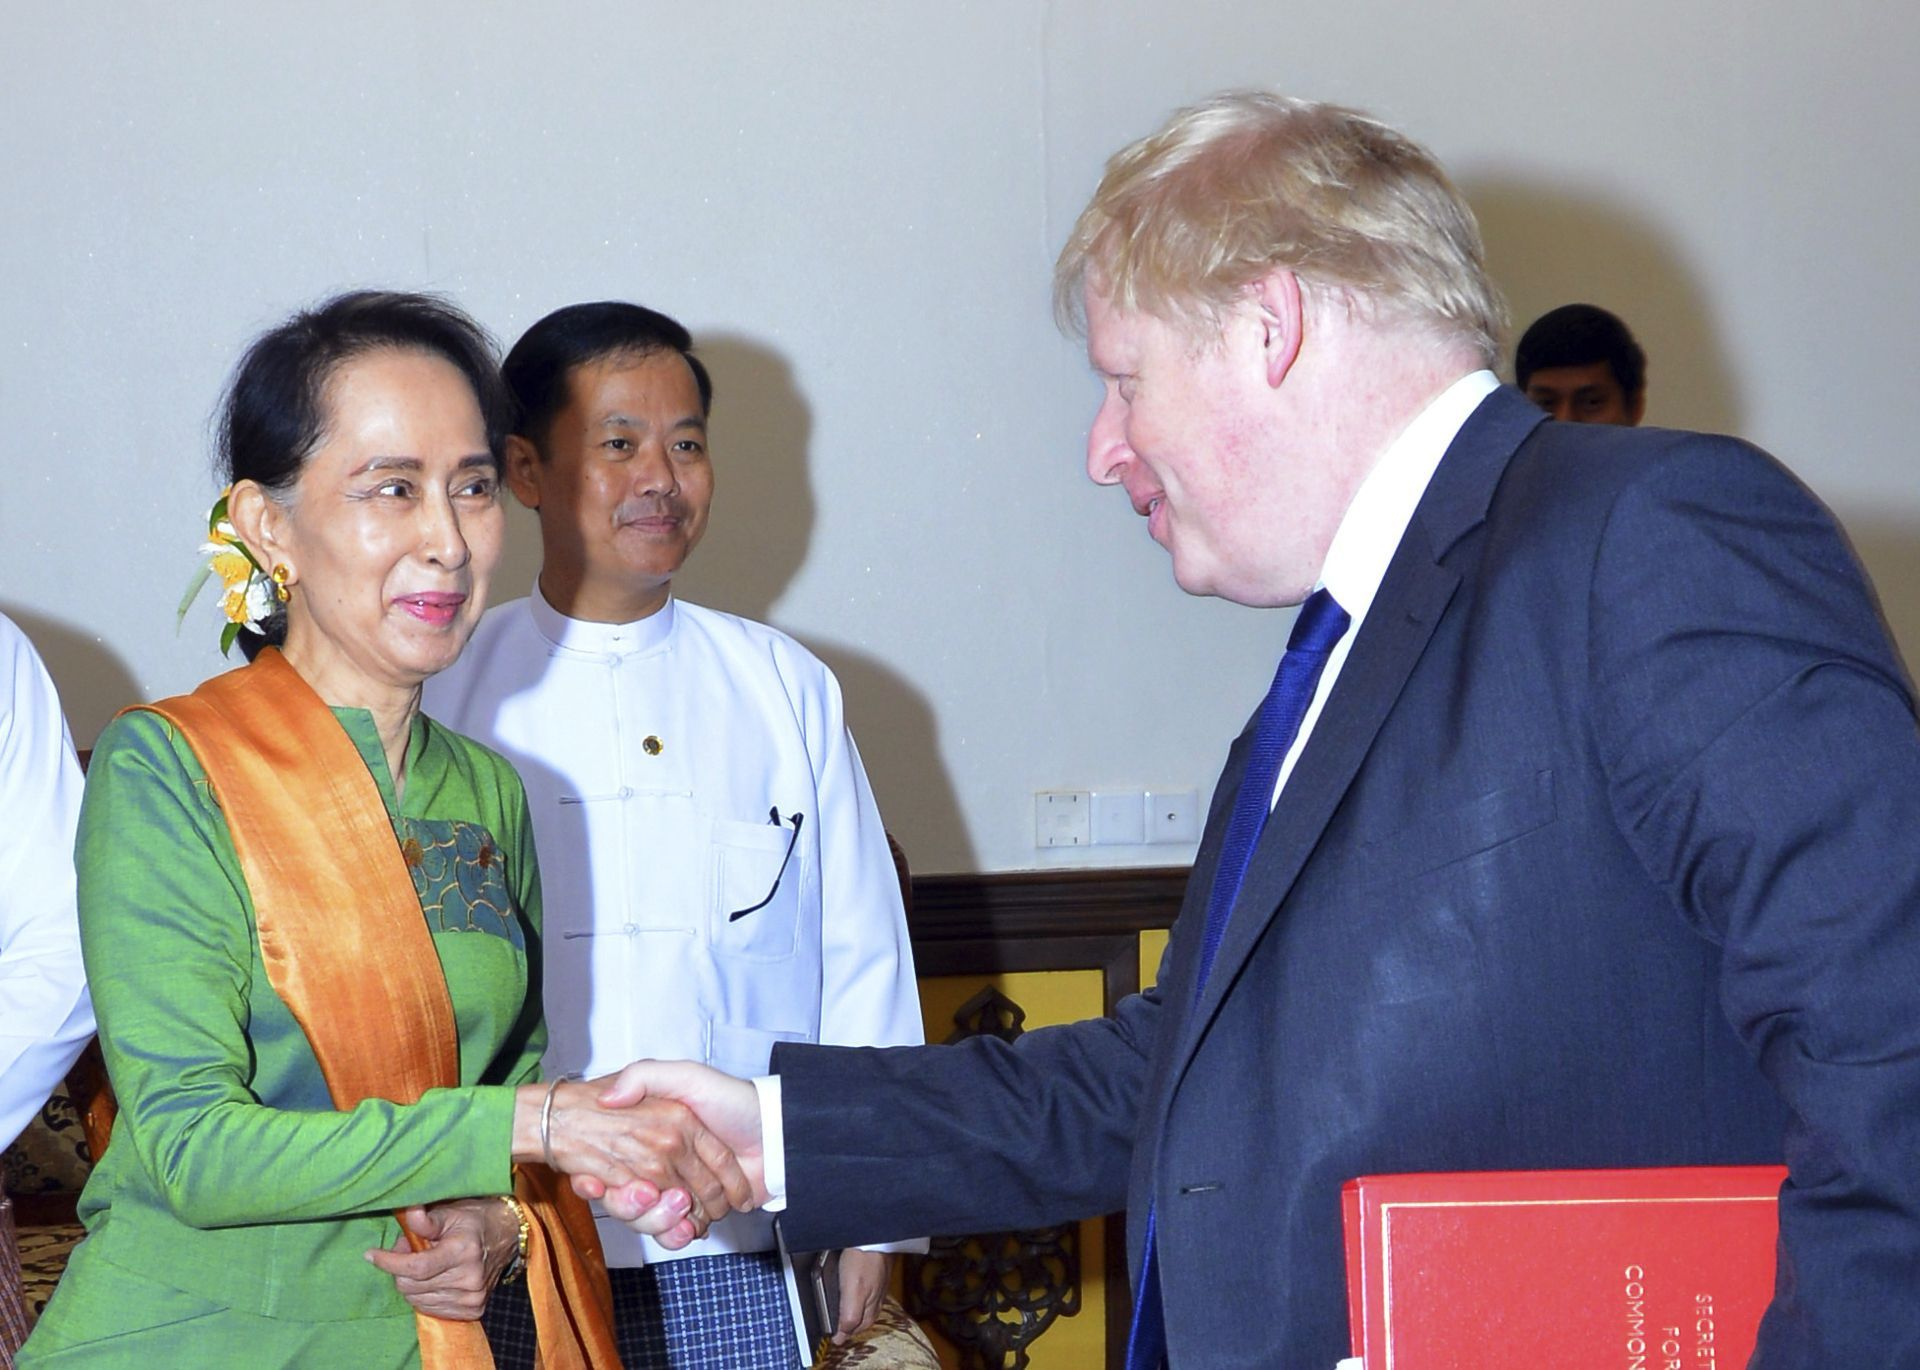 UK's top diplomat meets Myanmar's Suu Kyi on Rohingya